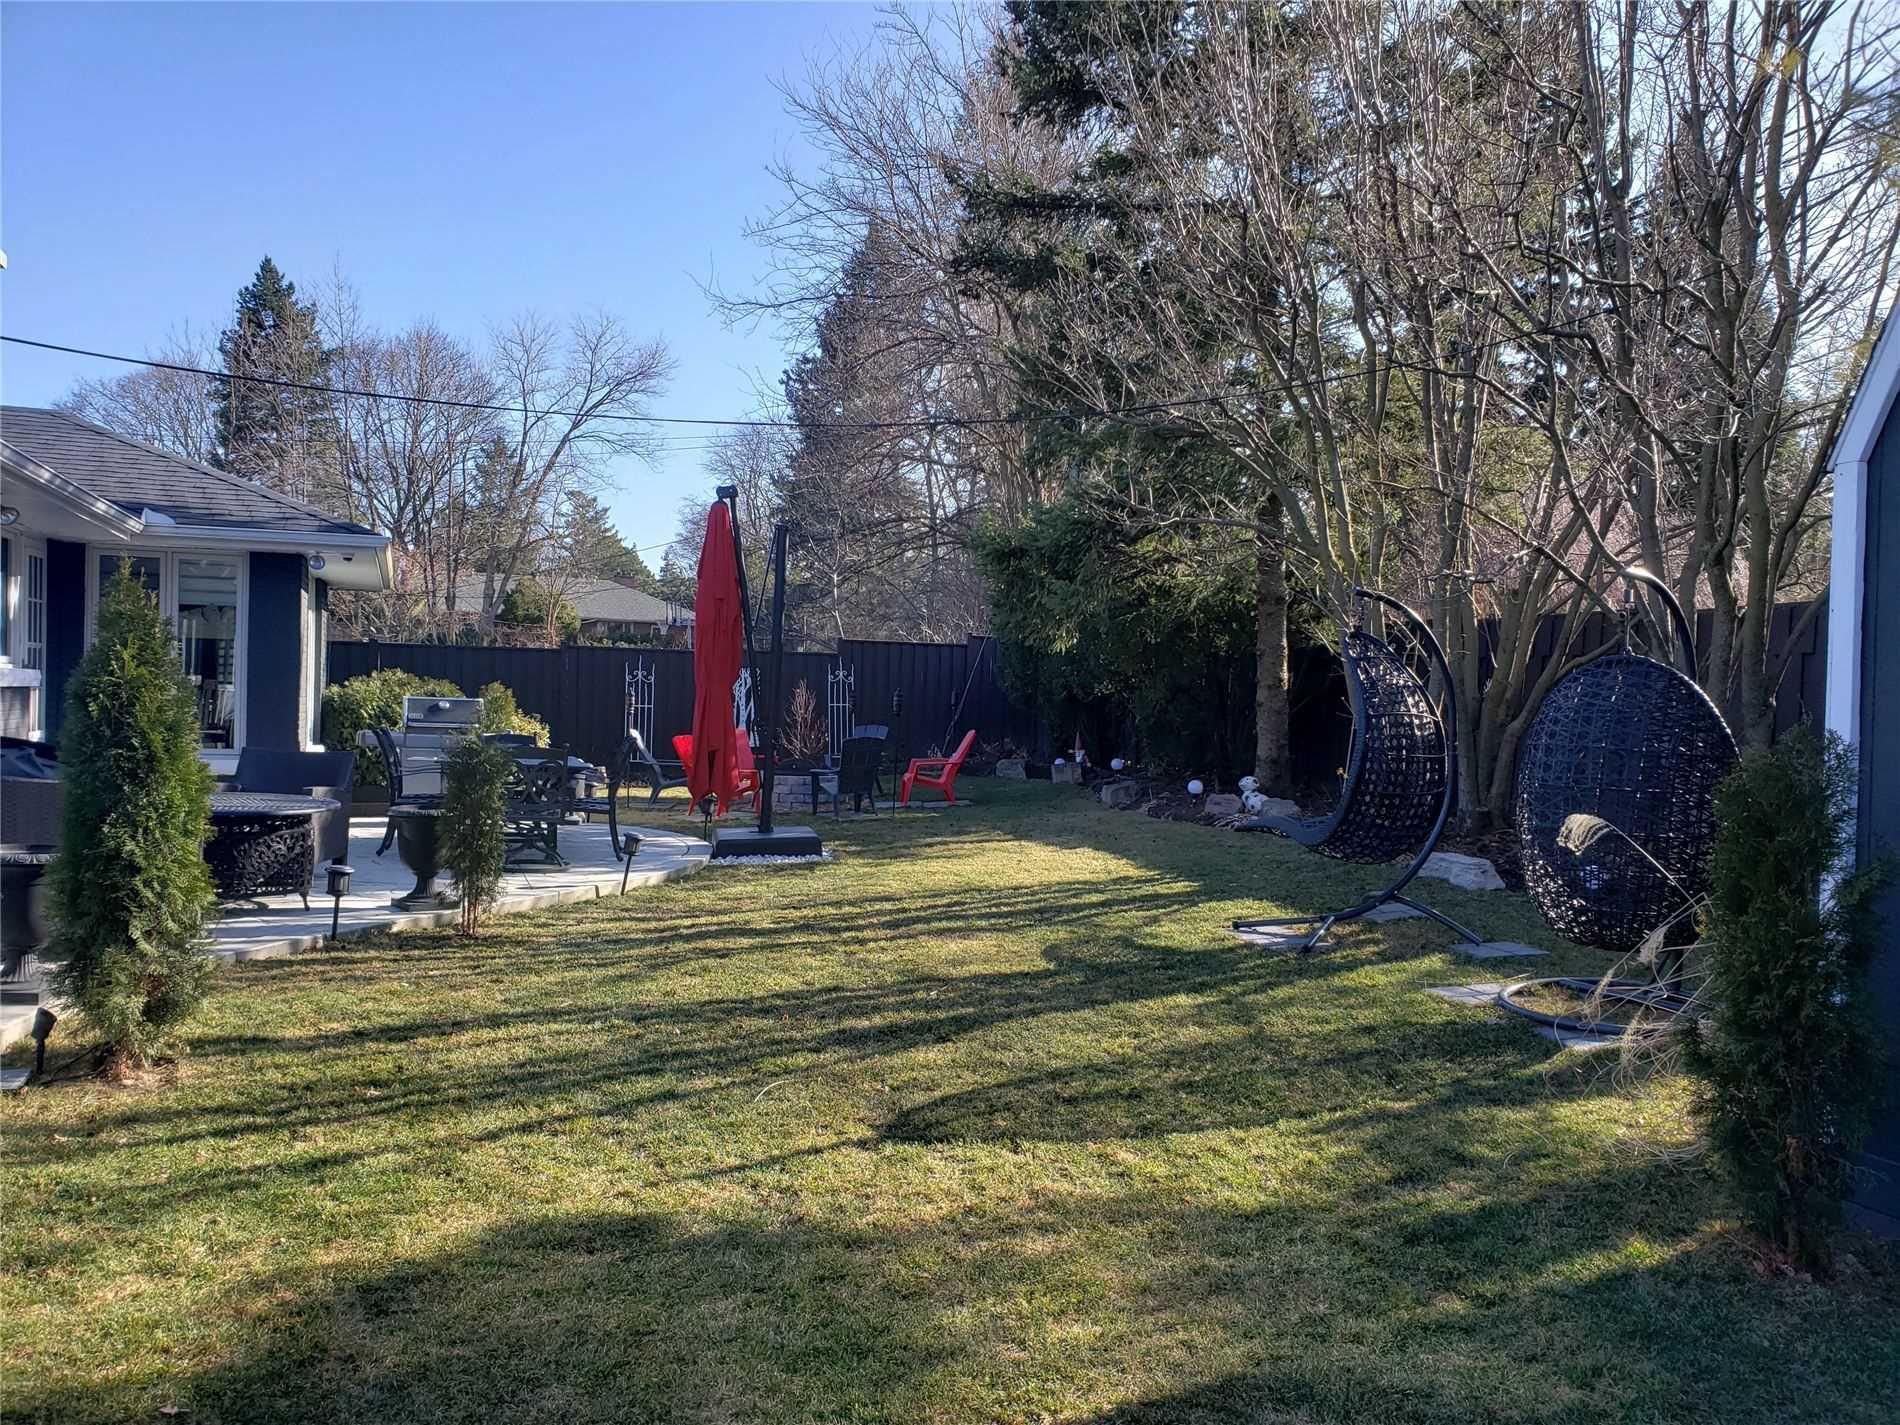 1594 Islington Ave, Toronto, Ontario M9A3M6, 3 Bedrooms Bedrooms, 8 Rooms Rooms,4 BathroomsBathrooms,Detached,For Sale,Islington,W5164240